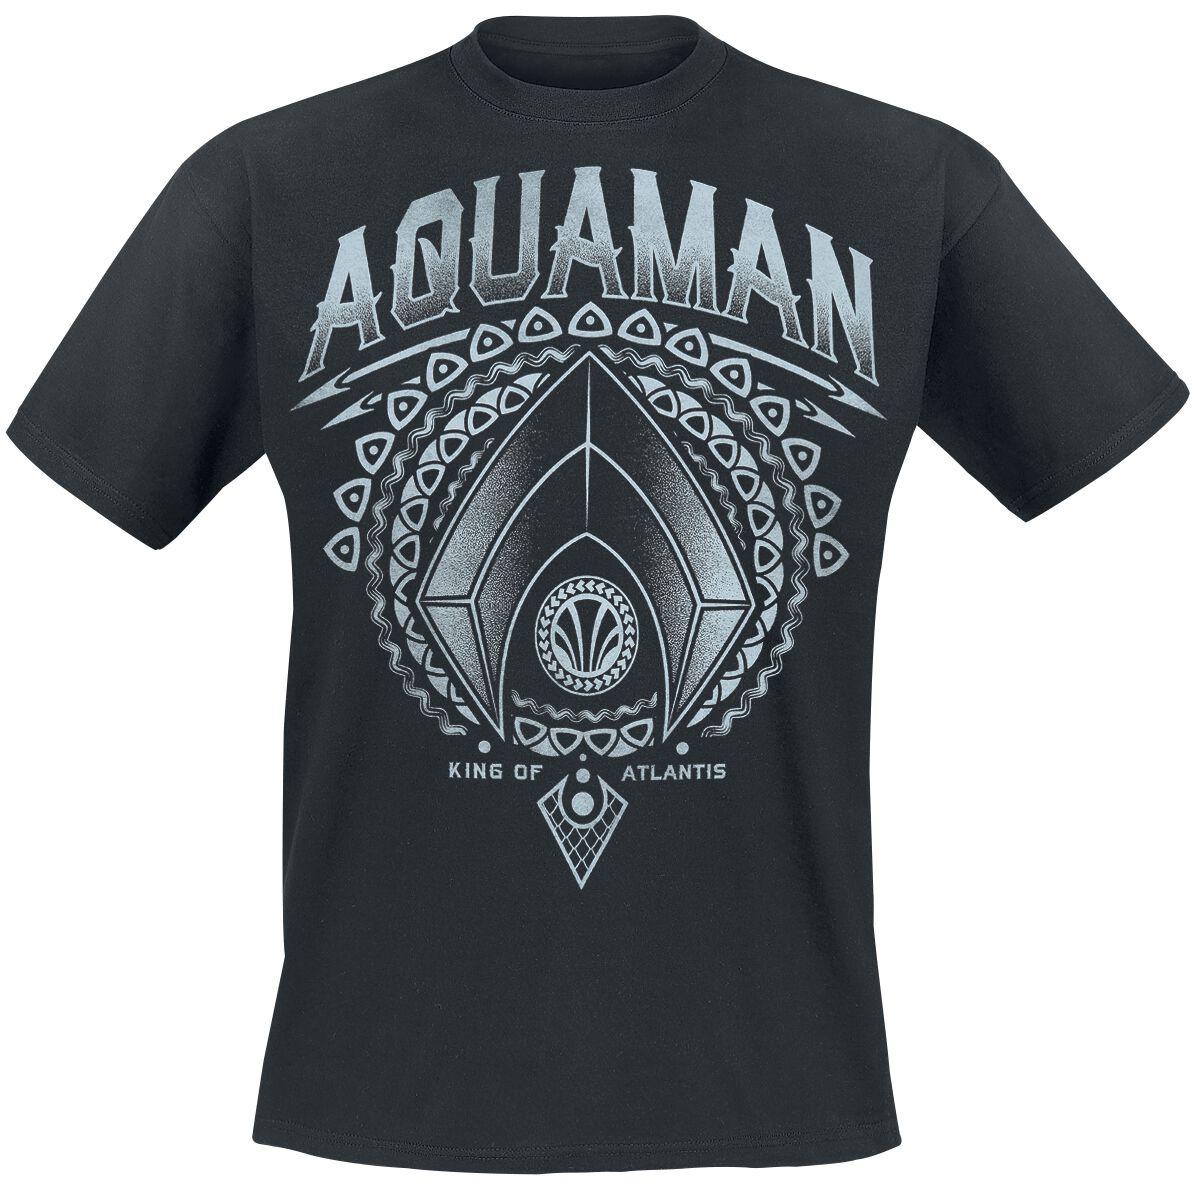 Image of   Justice League Aquaman - King Of Atlantis T-Shirt sort